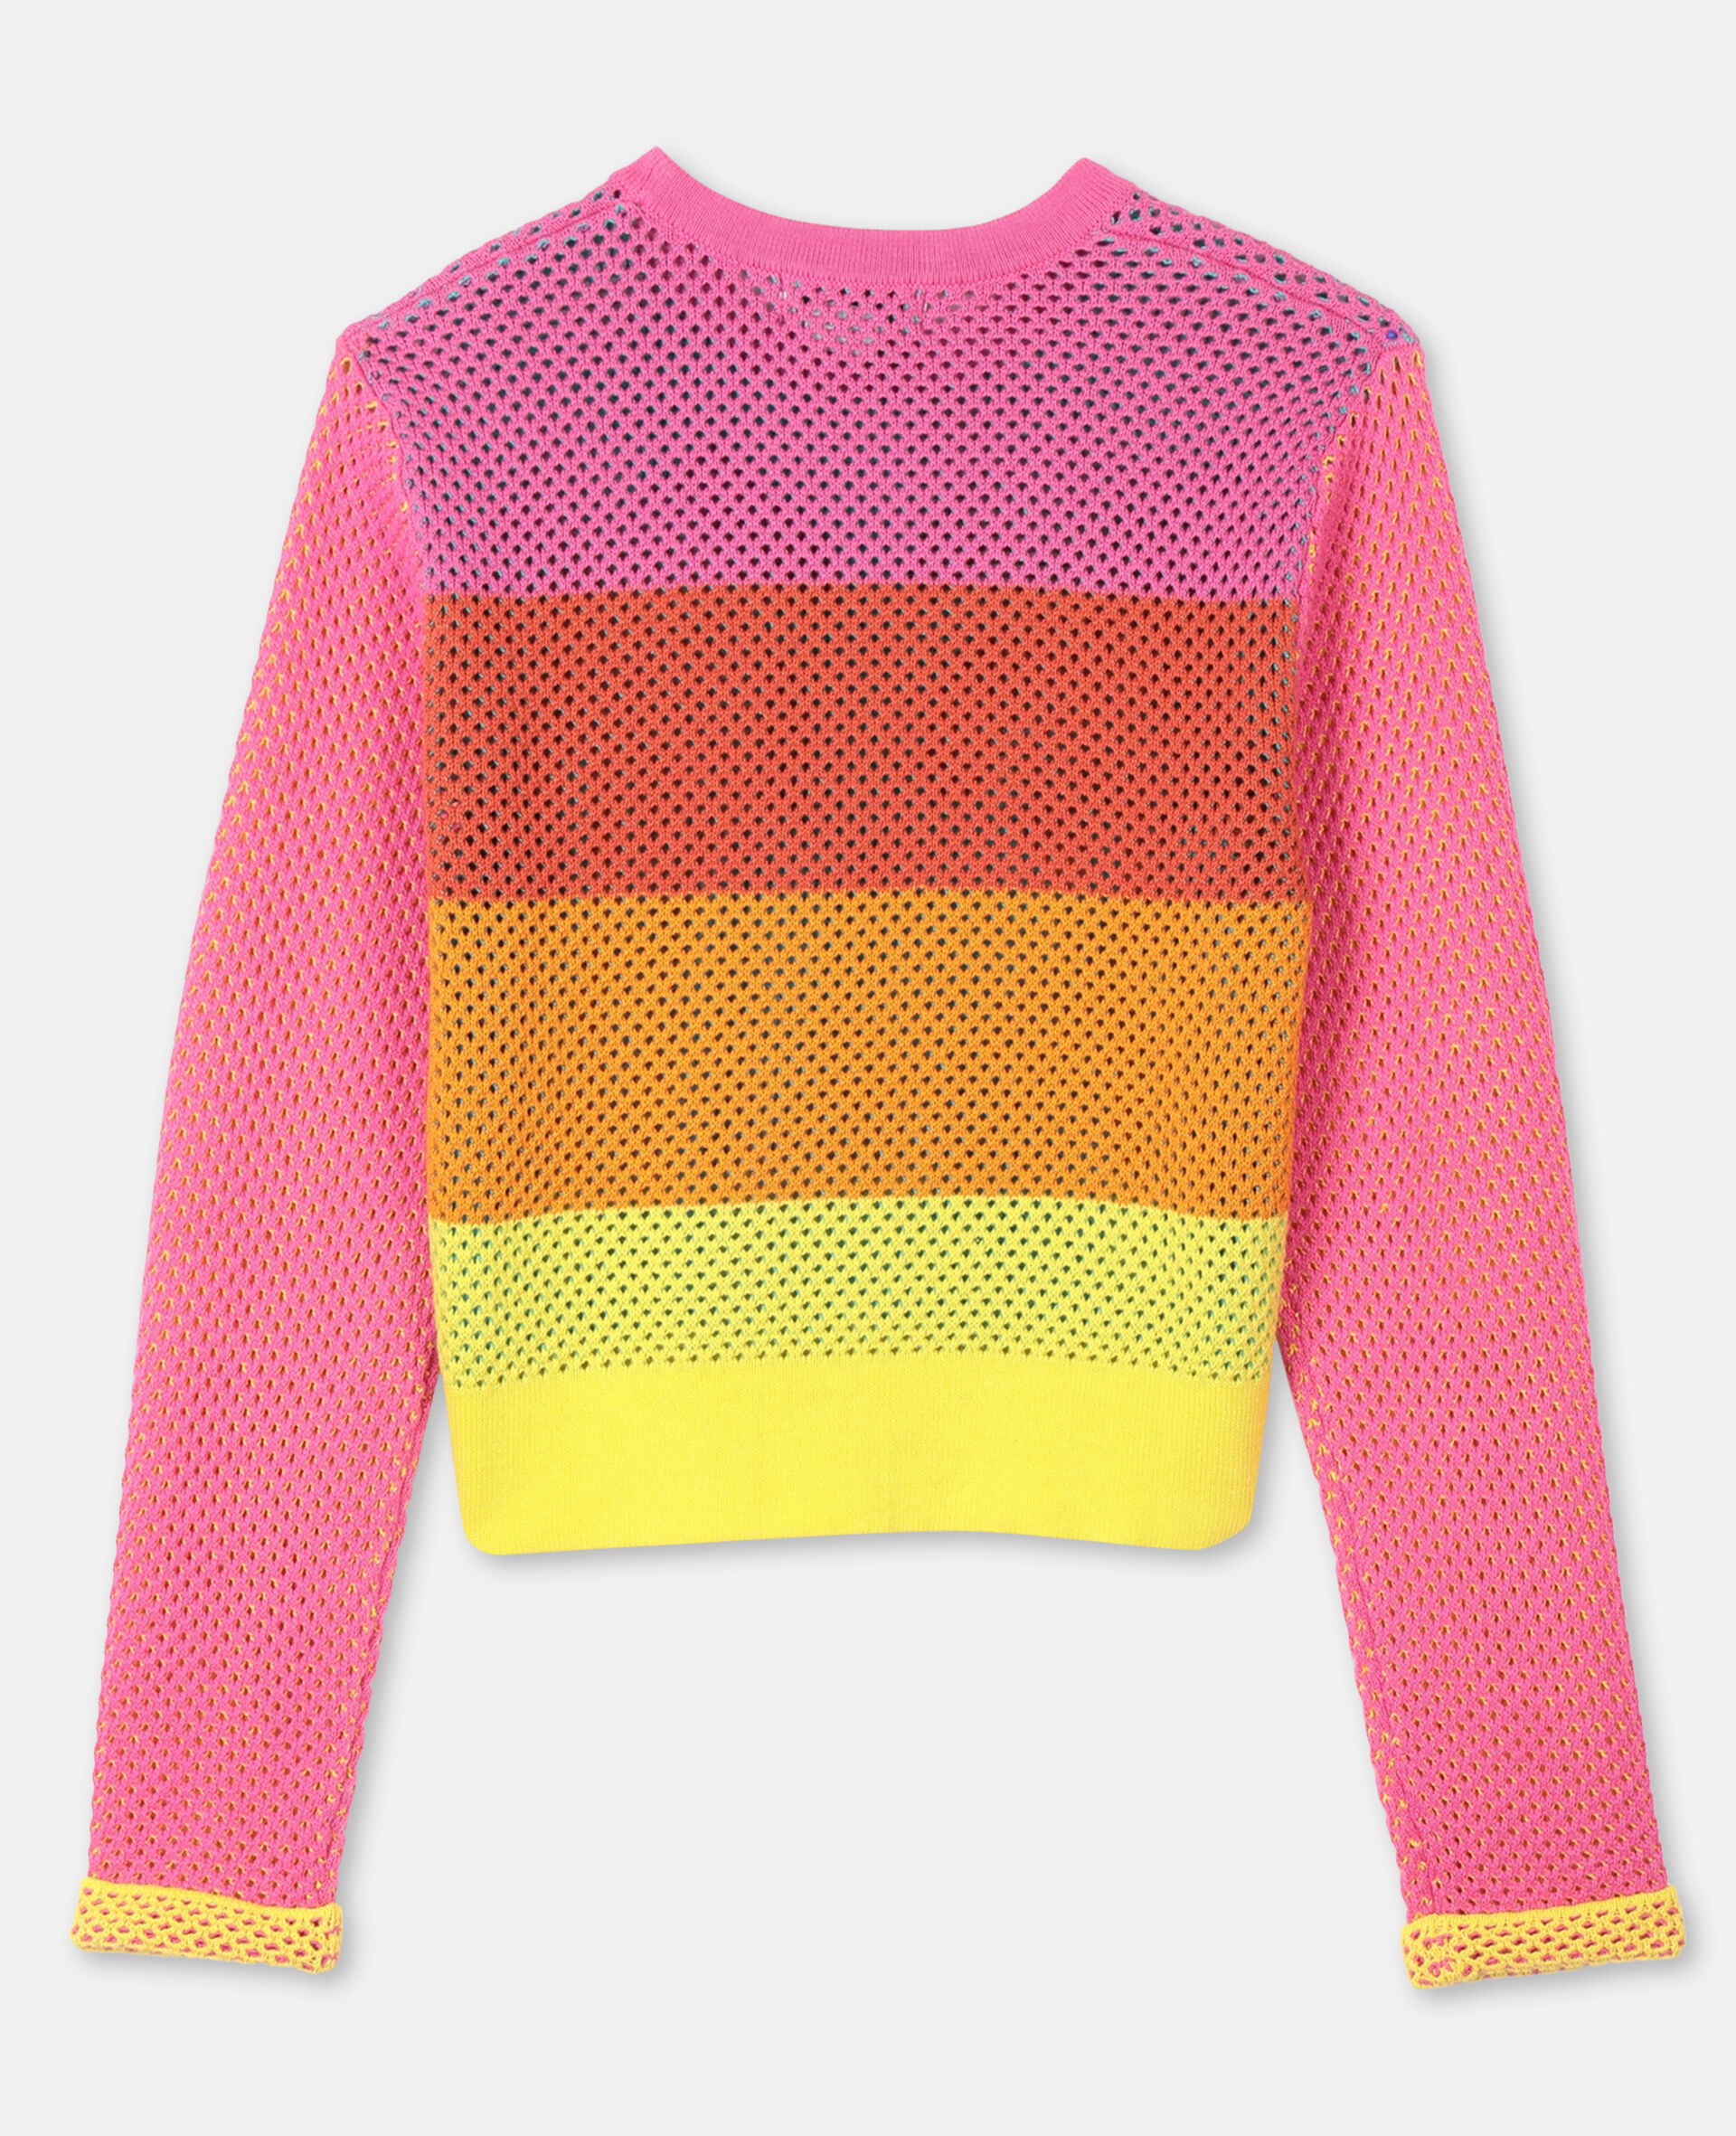 Intarsia Mesh Knit Cotton Jumper -Multicolour-large image number 3